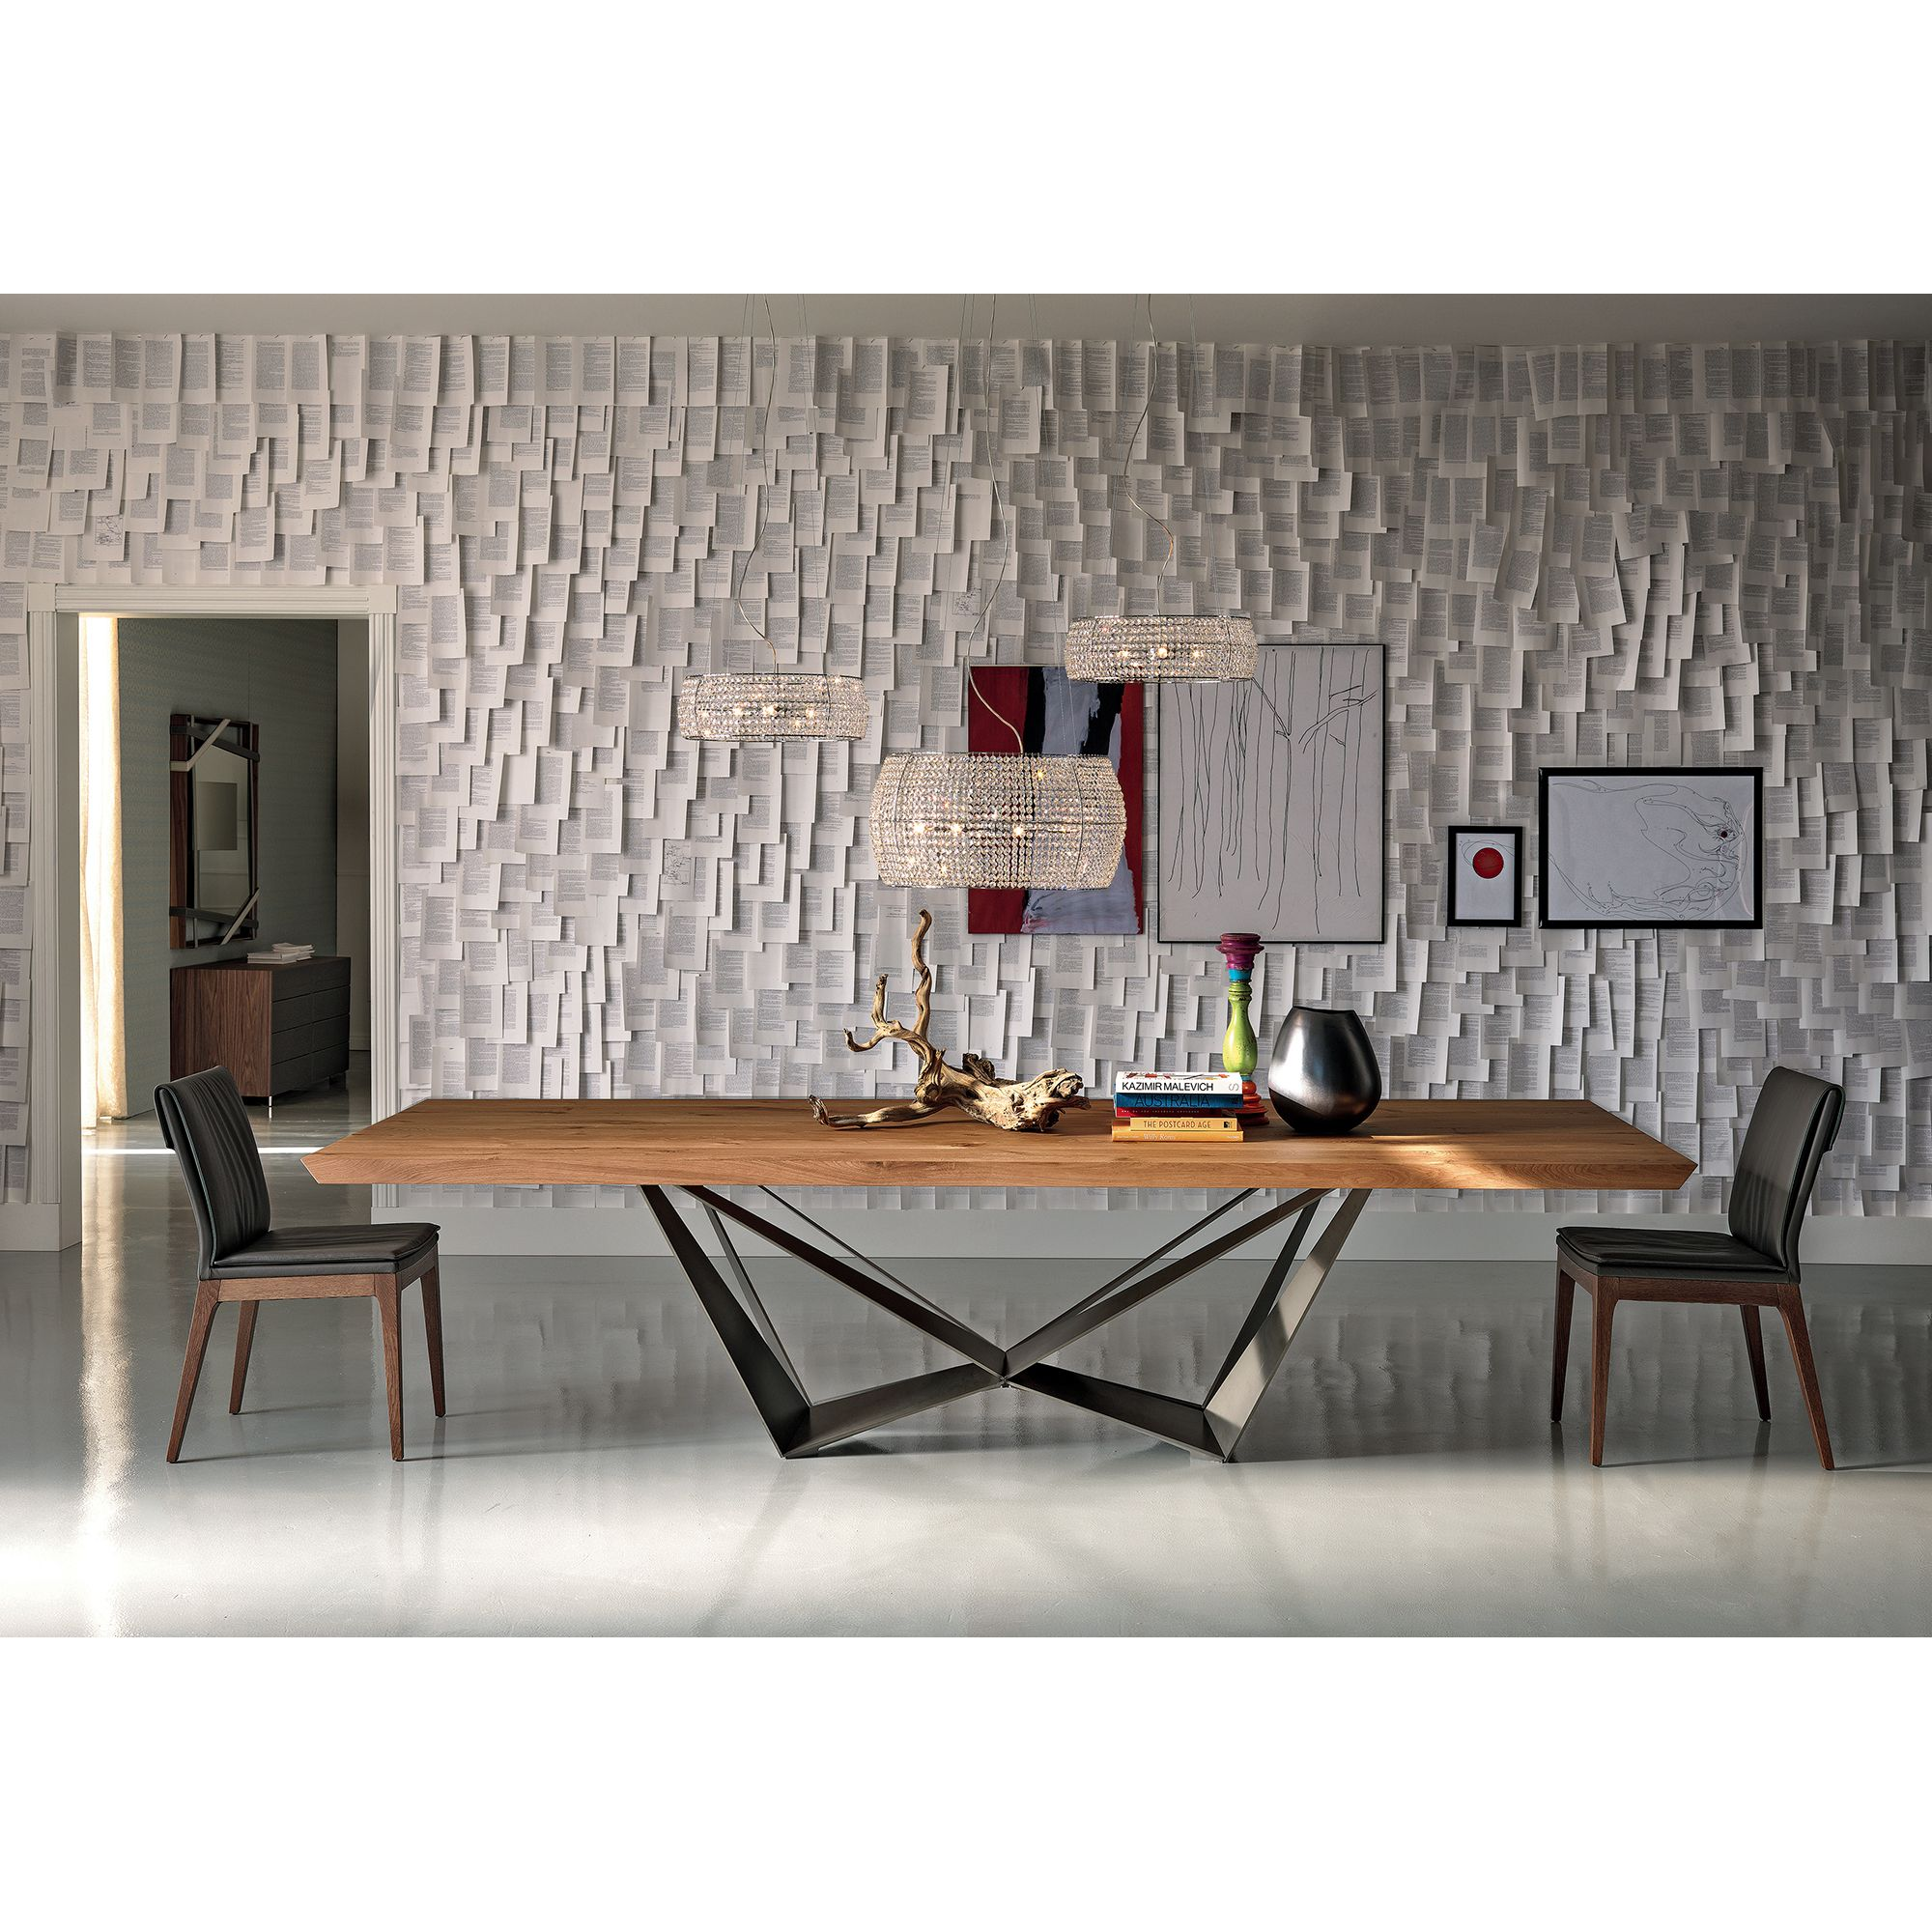 Skorpio Dining Table Contemporary Dining Table Modern Dining